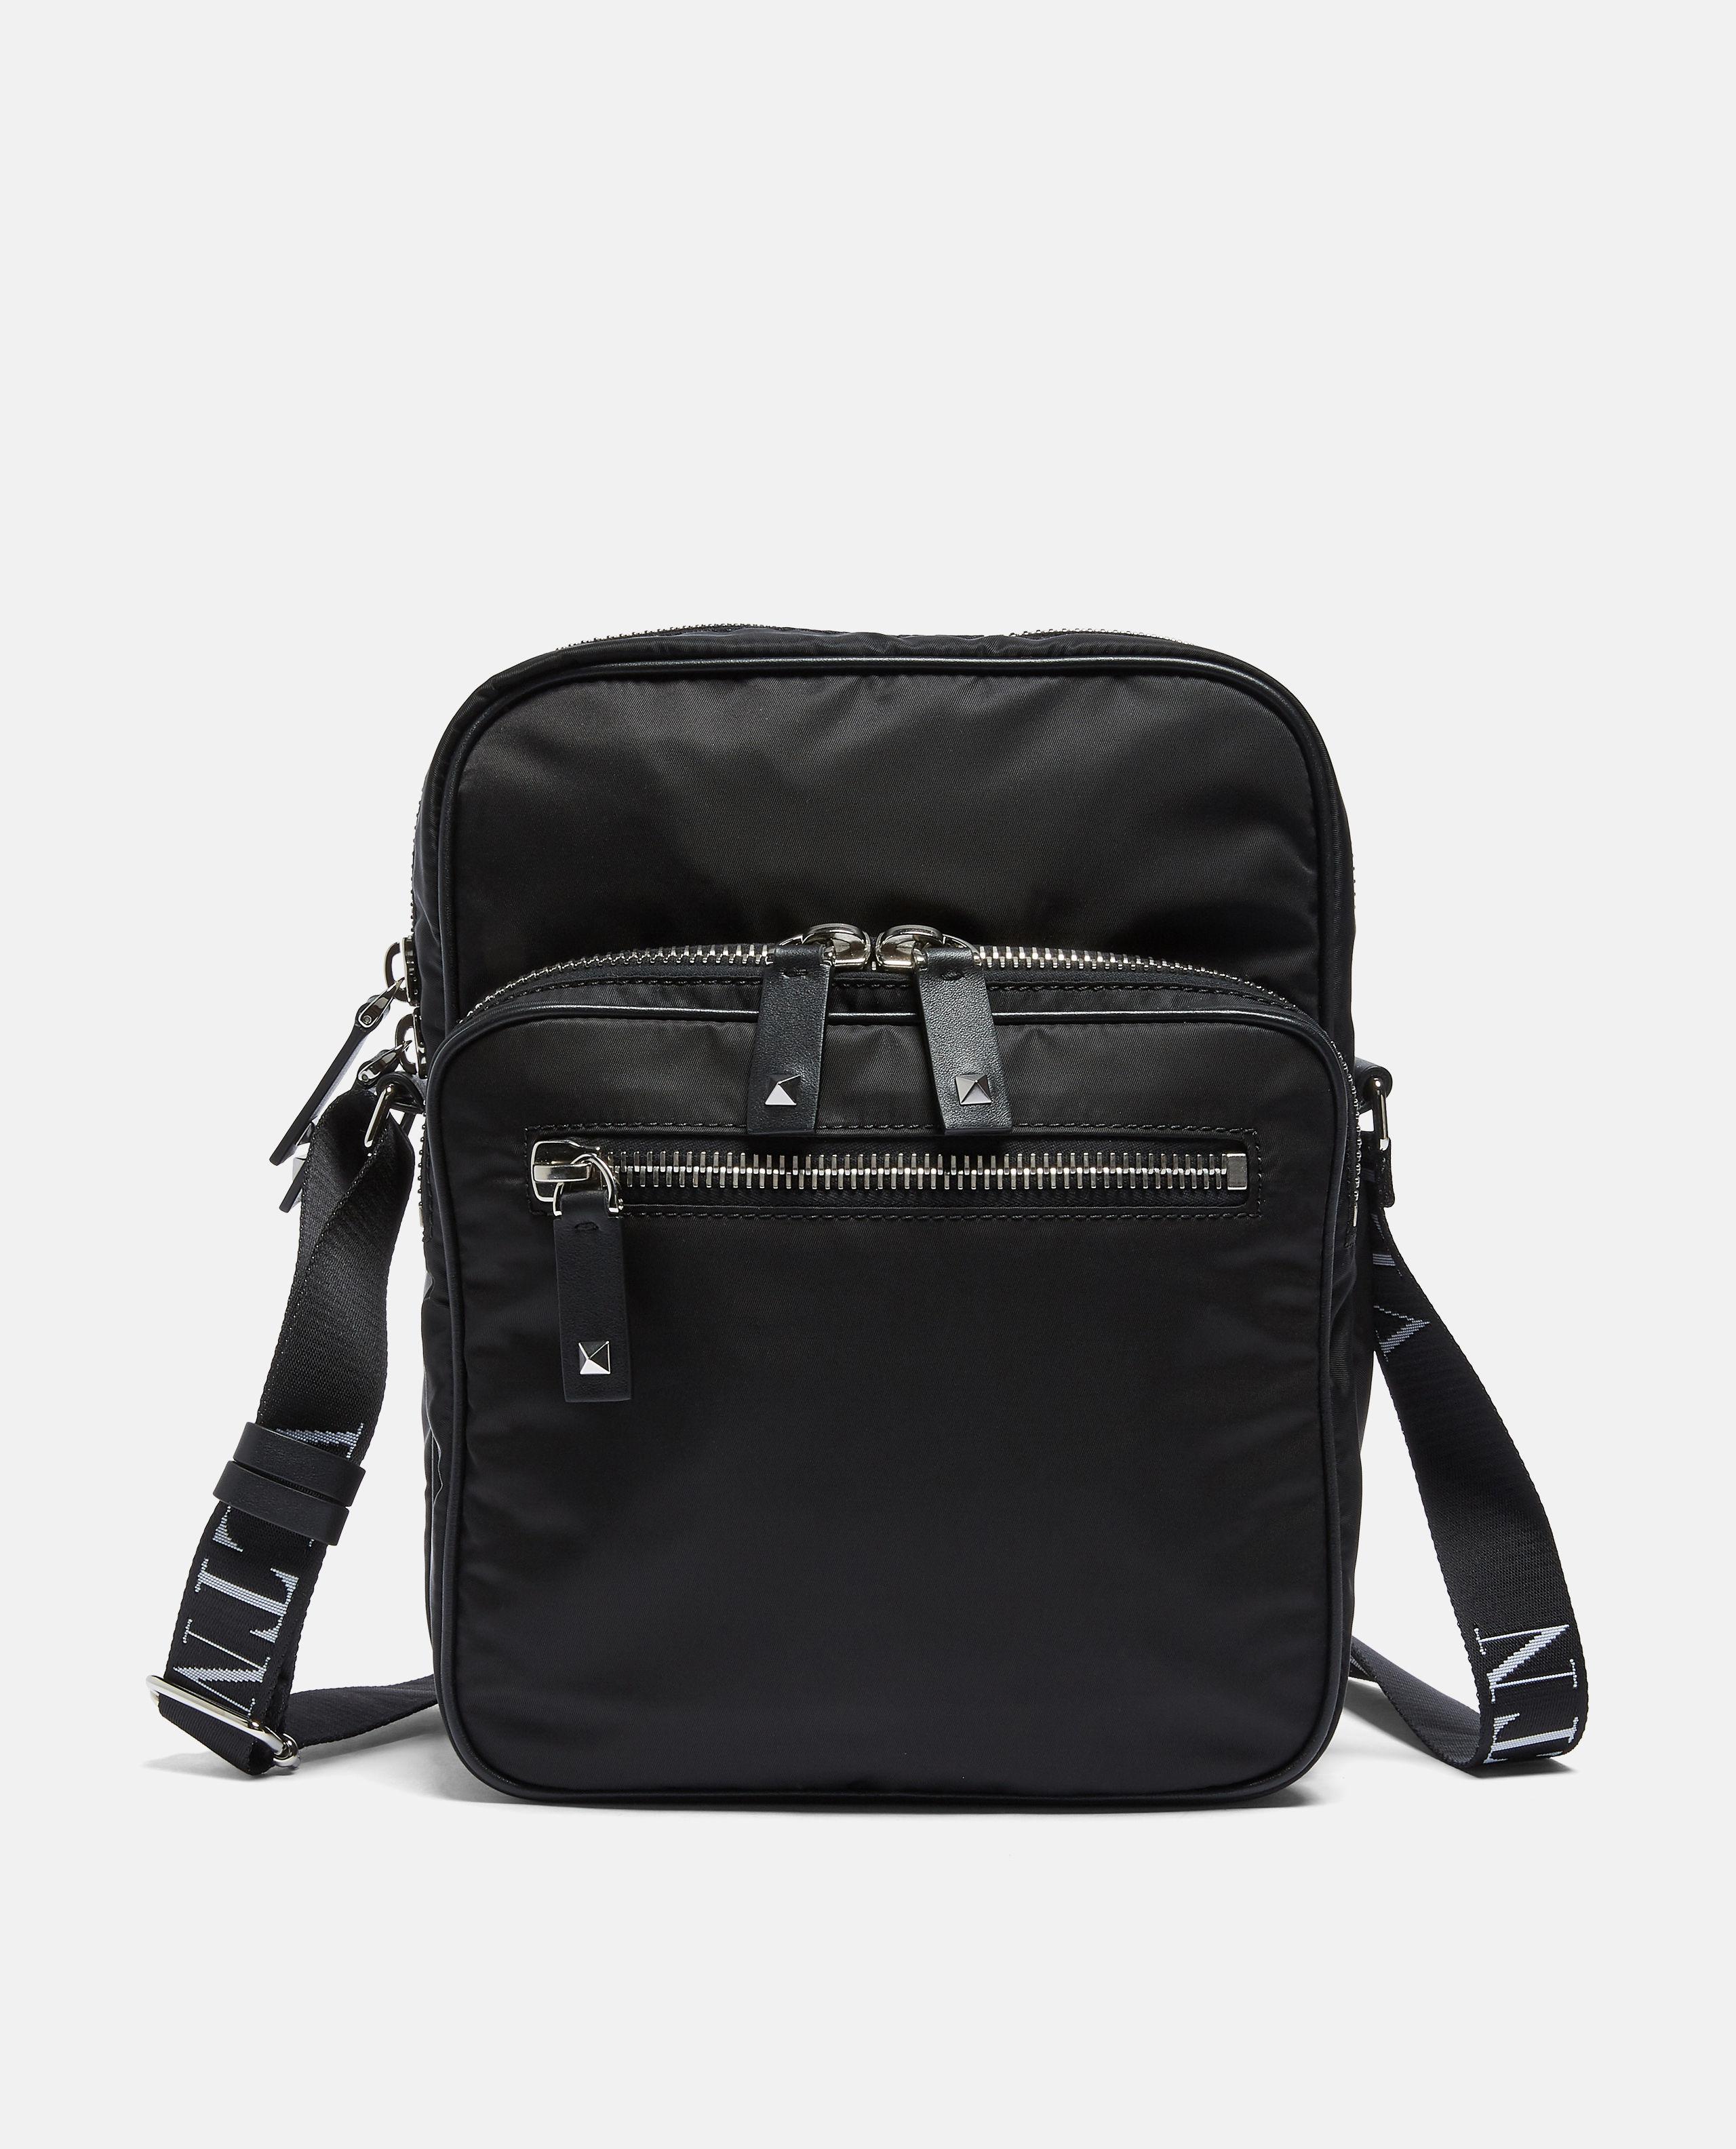 3f266f3cfe89 Valentino Three Pocket Bag in Black for Men - Lyst